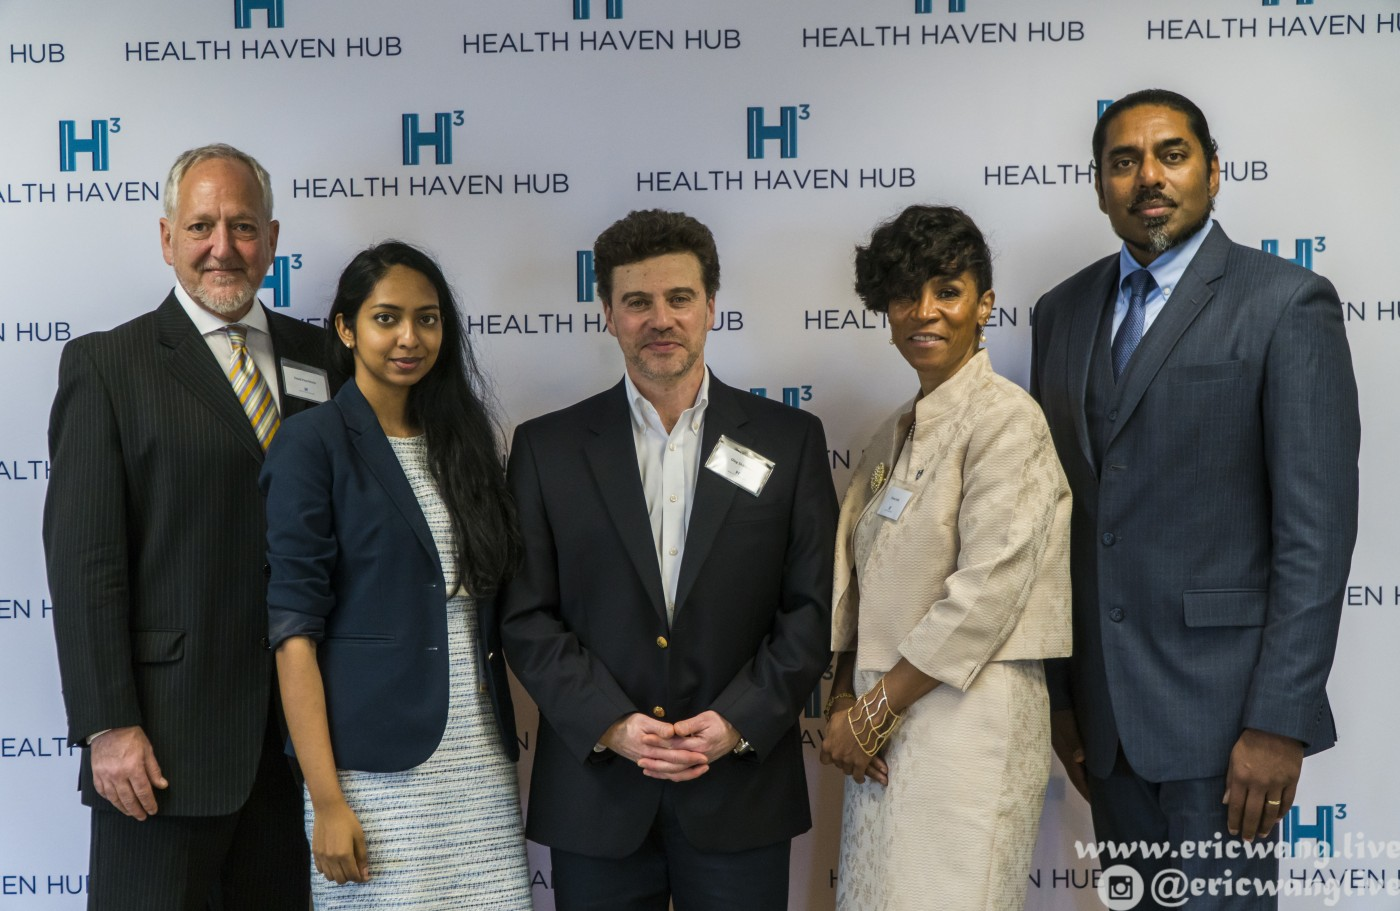 Dr. David Pearlstone, Kirthi Bellamkonda, Oleg Shikhman, Donna Lecky, and Sri Muthu